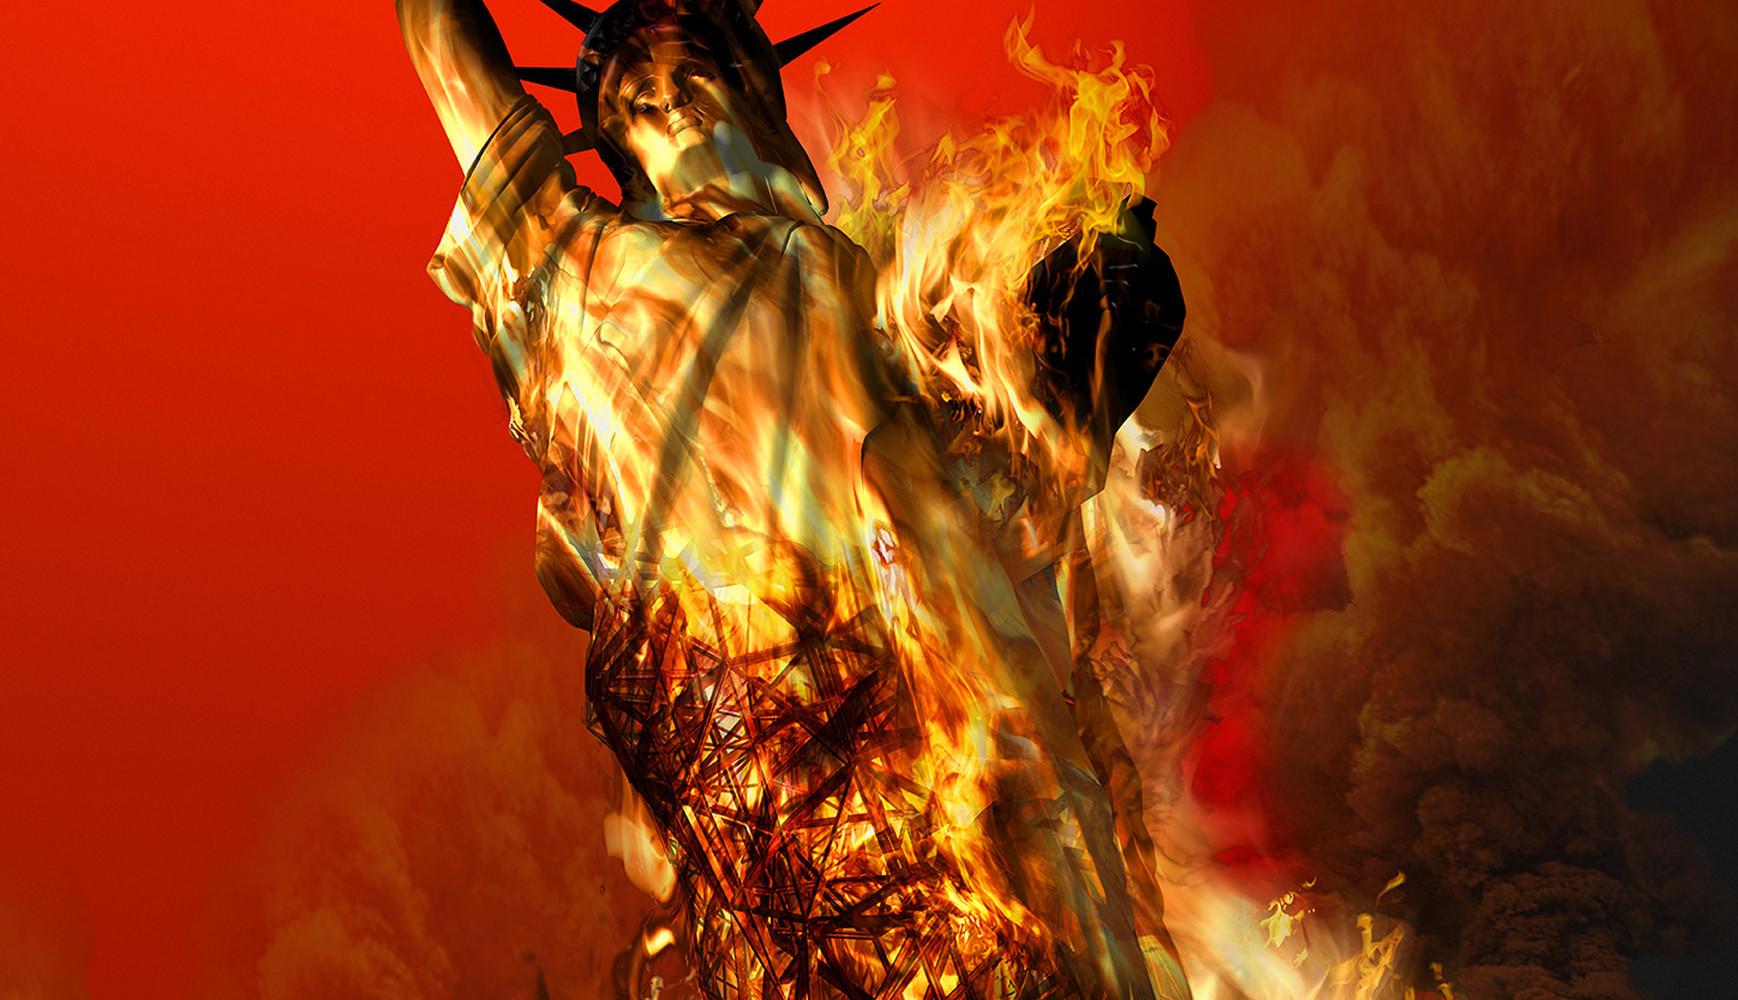 Liberty-fire-HDfire-2020-04 .jpg